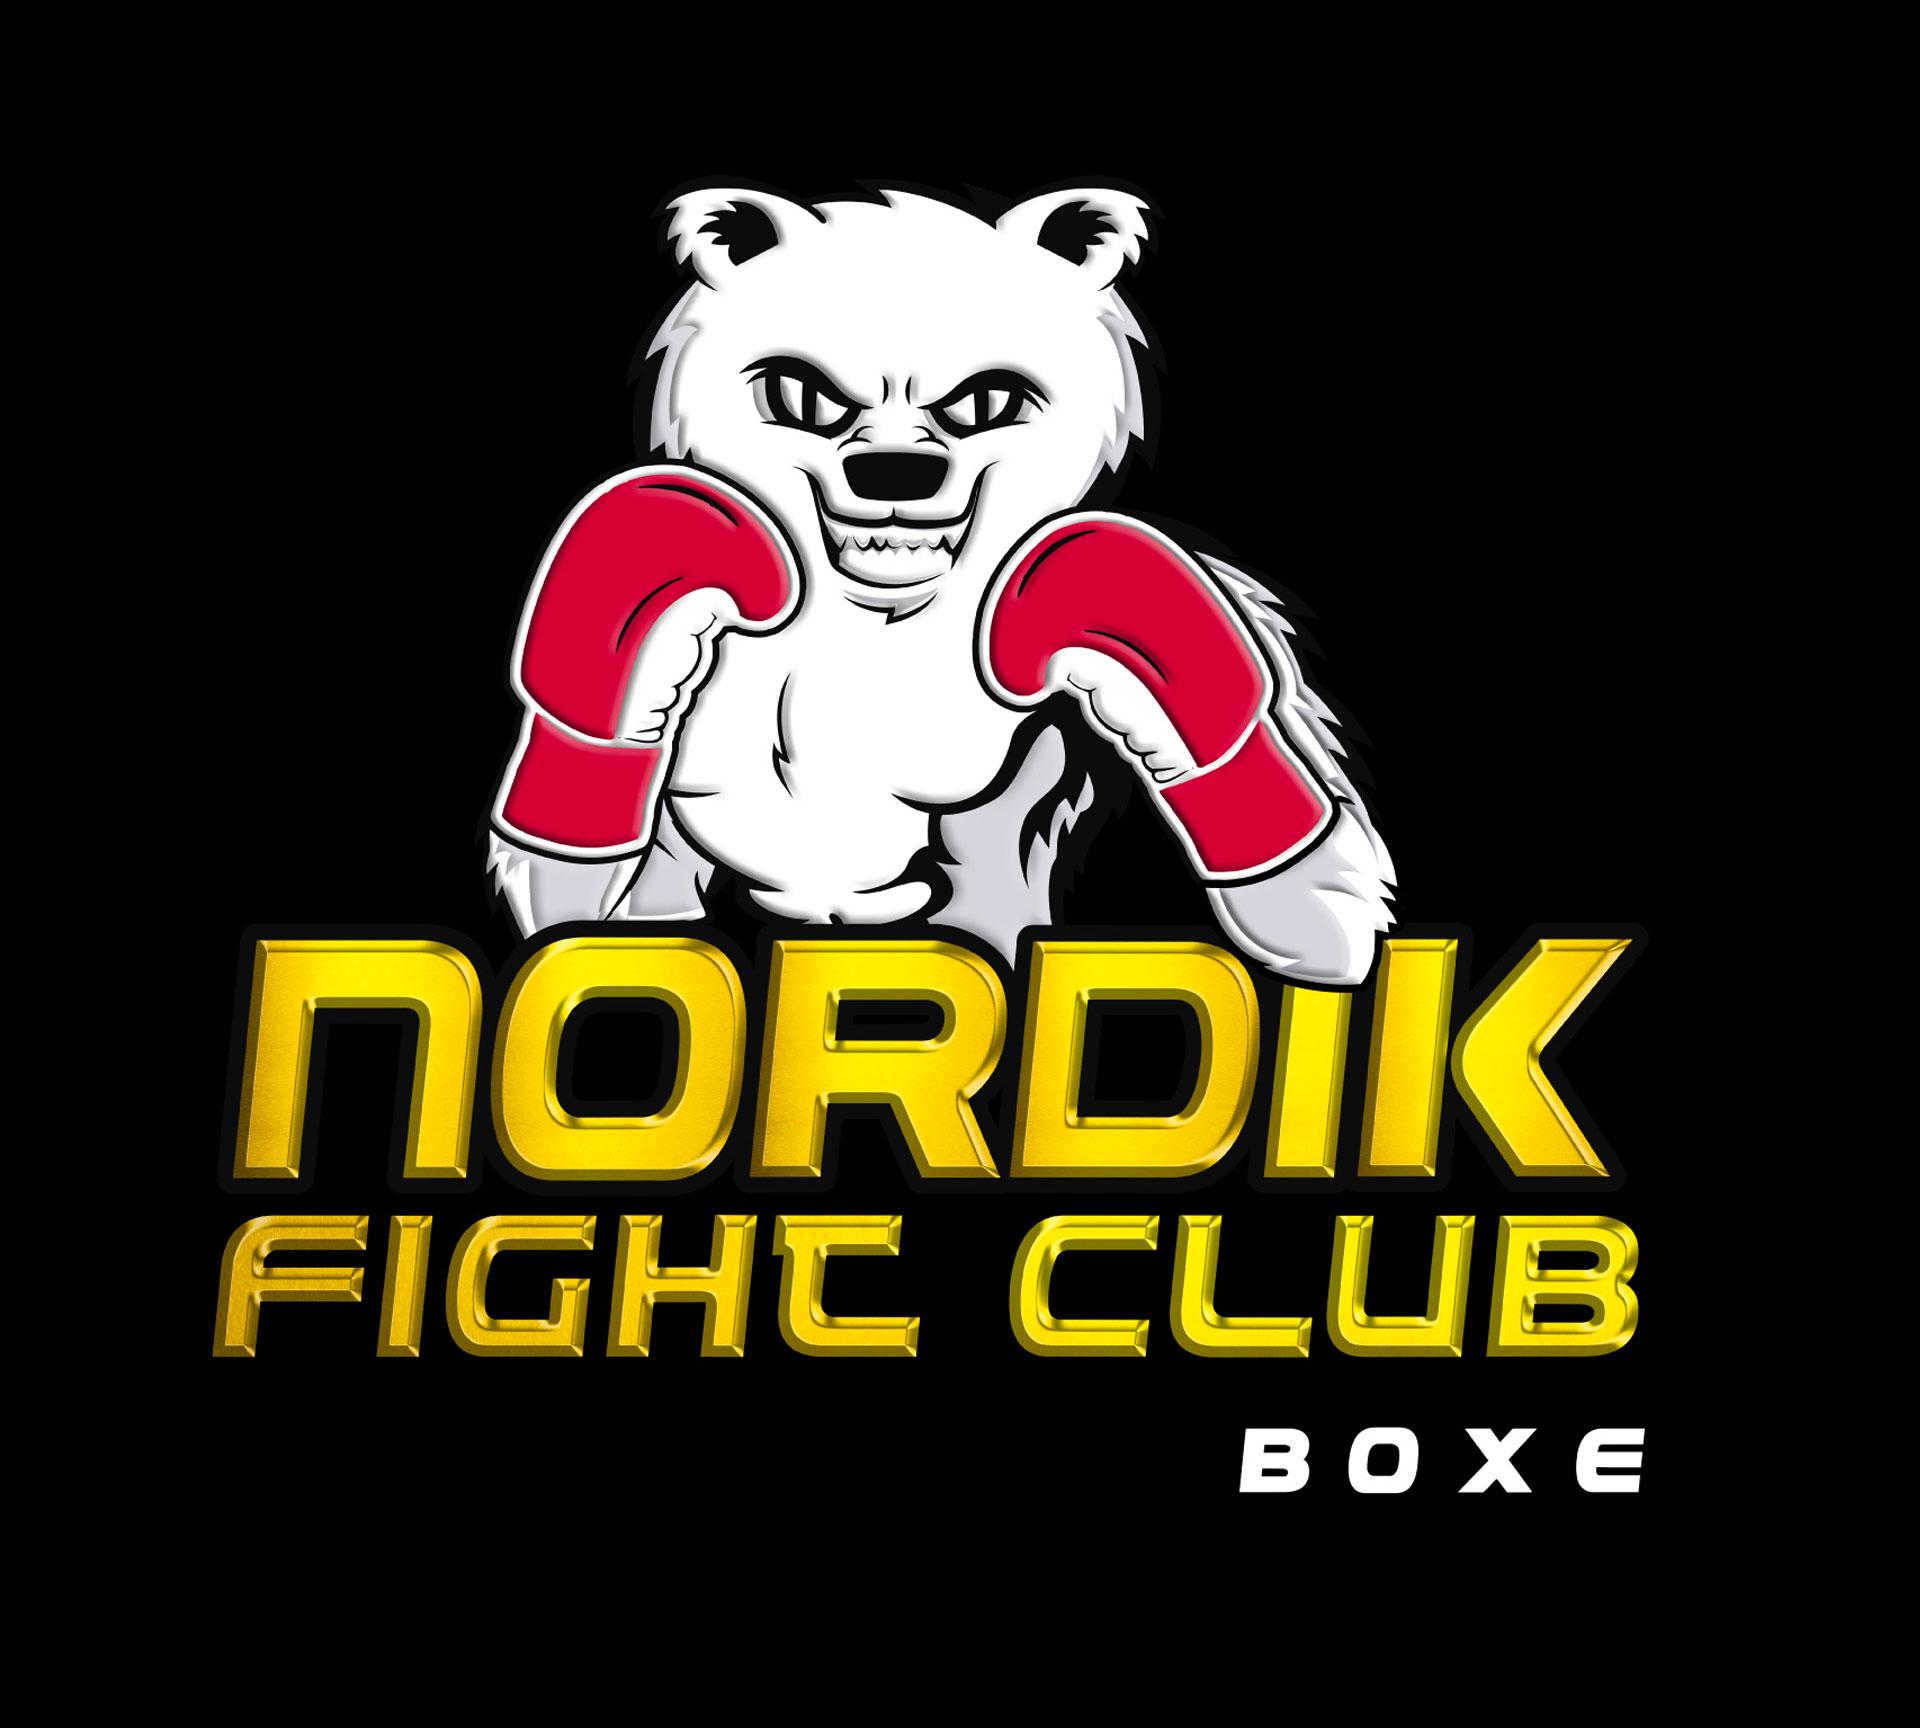 Nordik Fight Club boxe